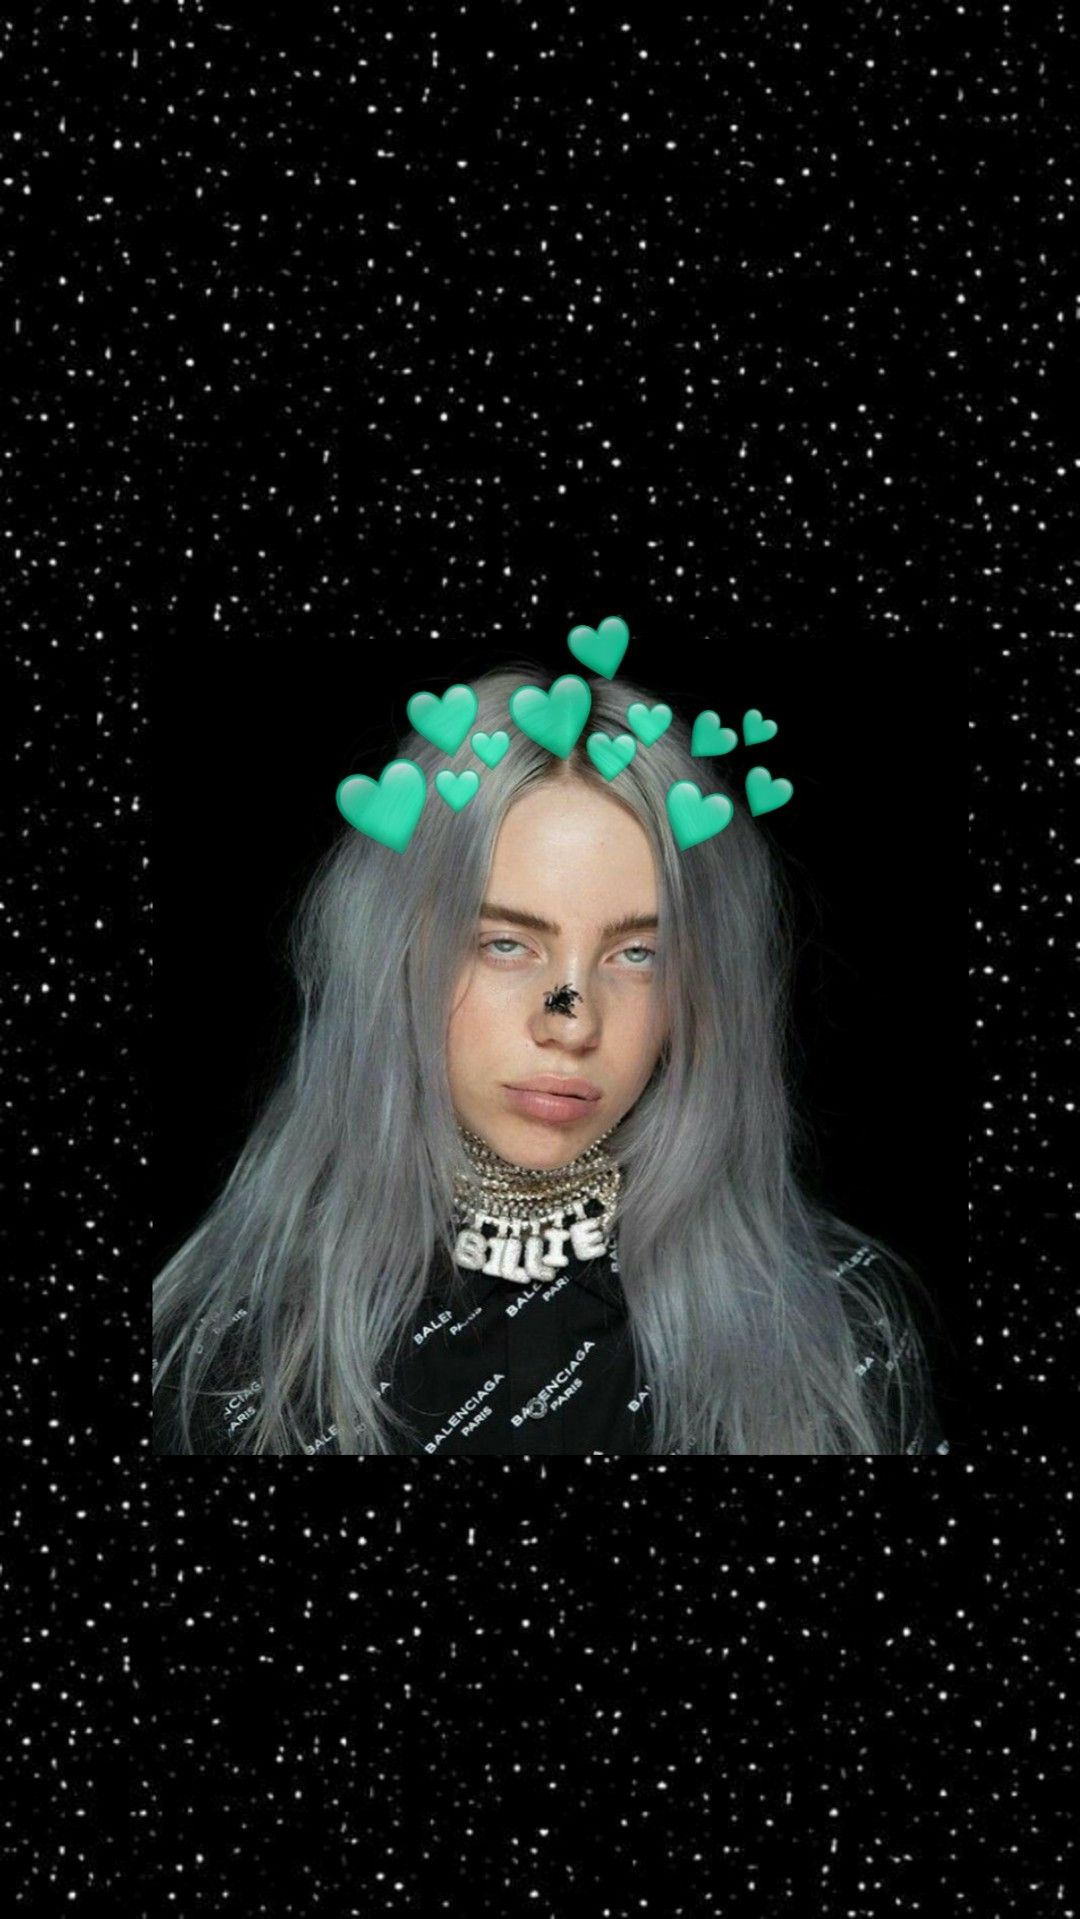 Billie Eilish Wallpaper Billie Eilish Billie Stylish Girl Pic